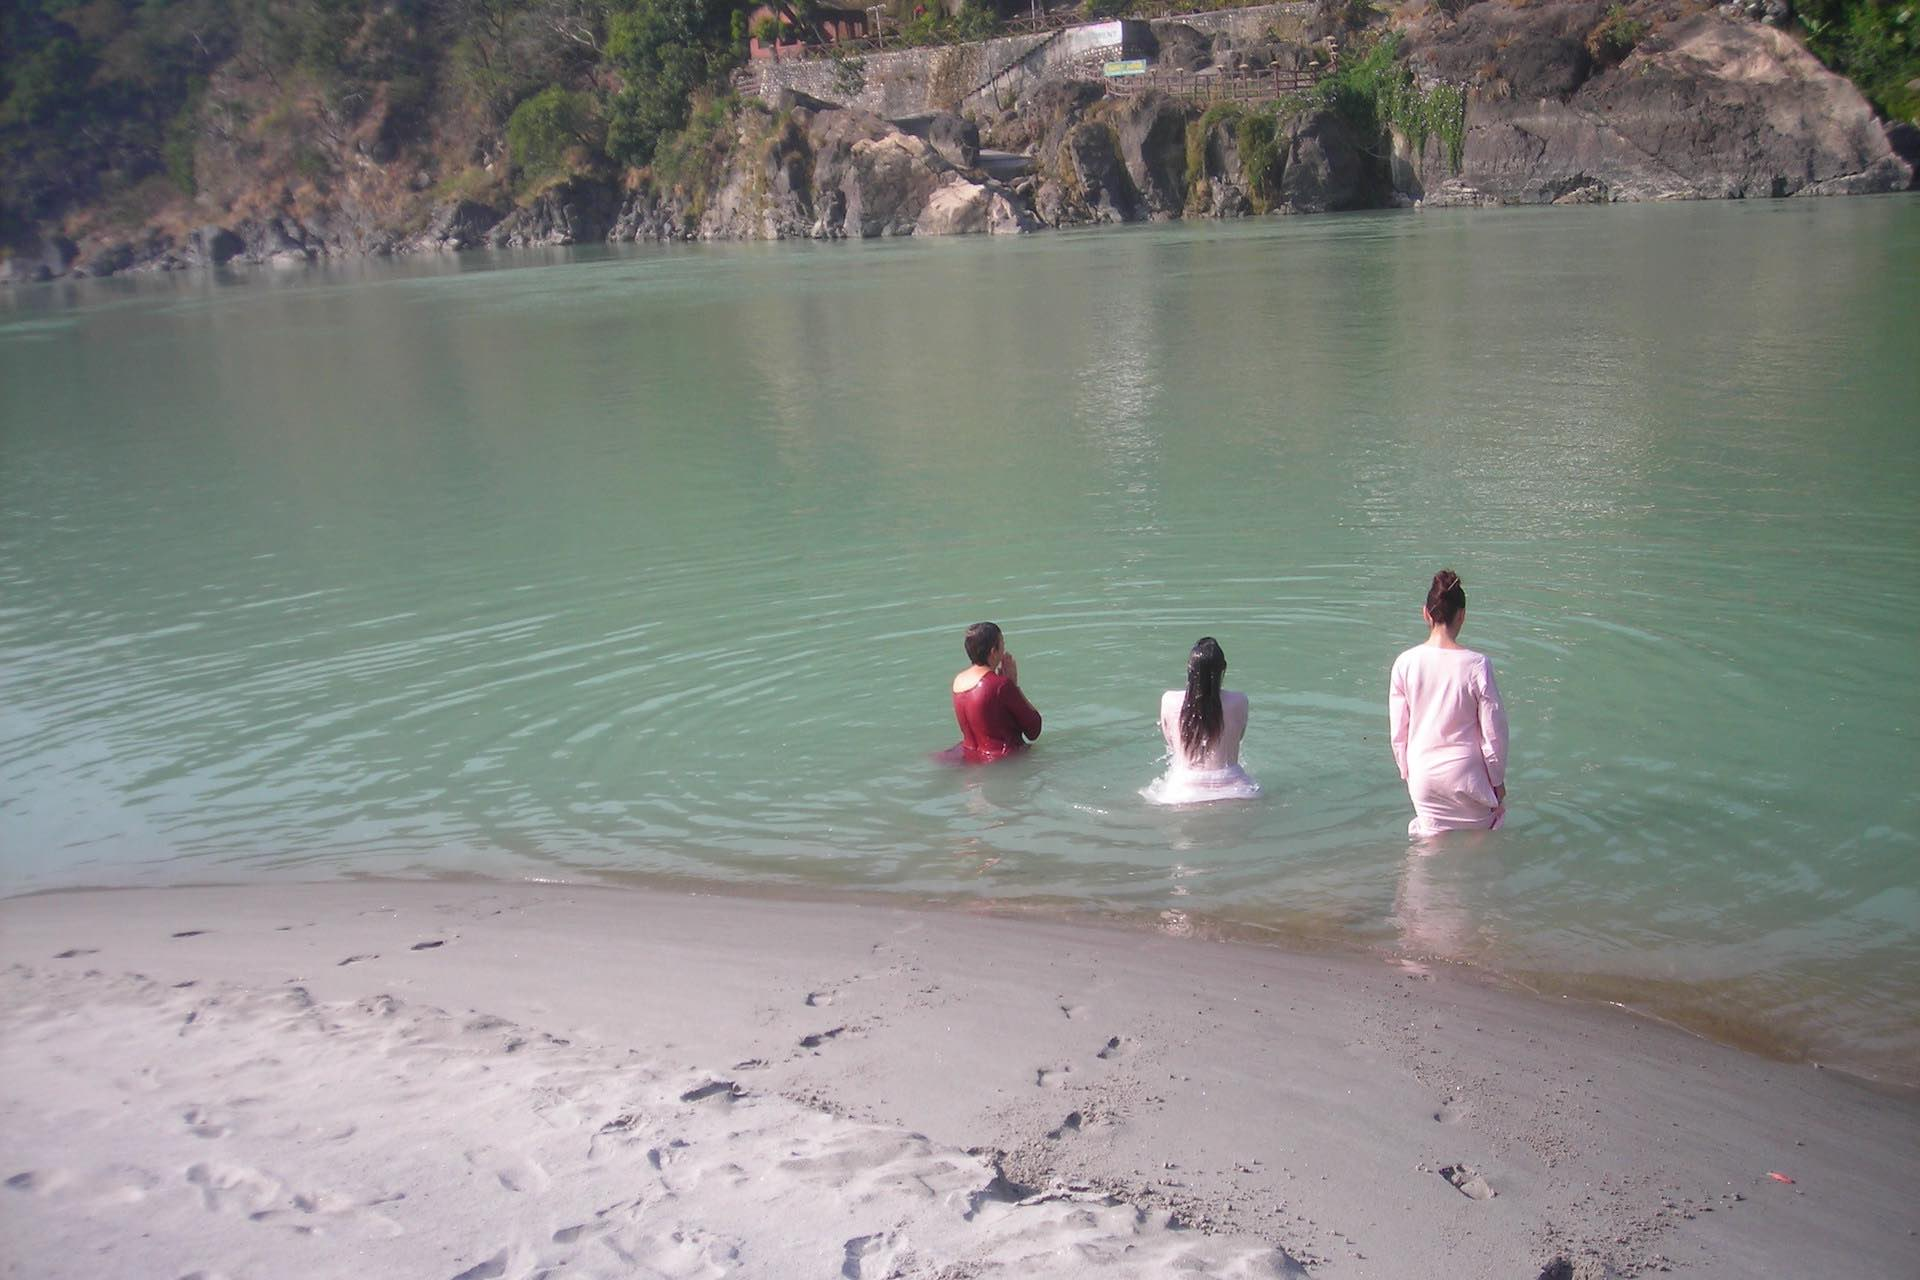 Incontri a Kochi India